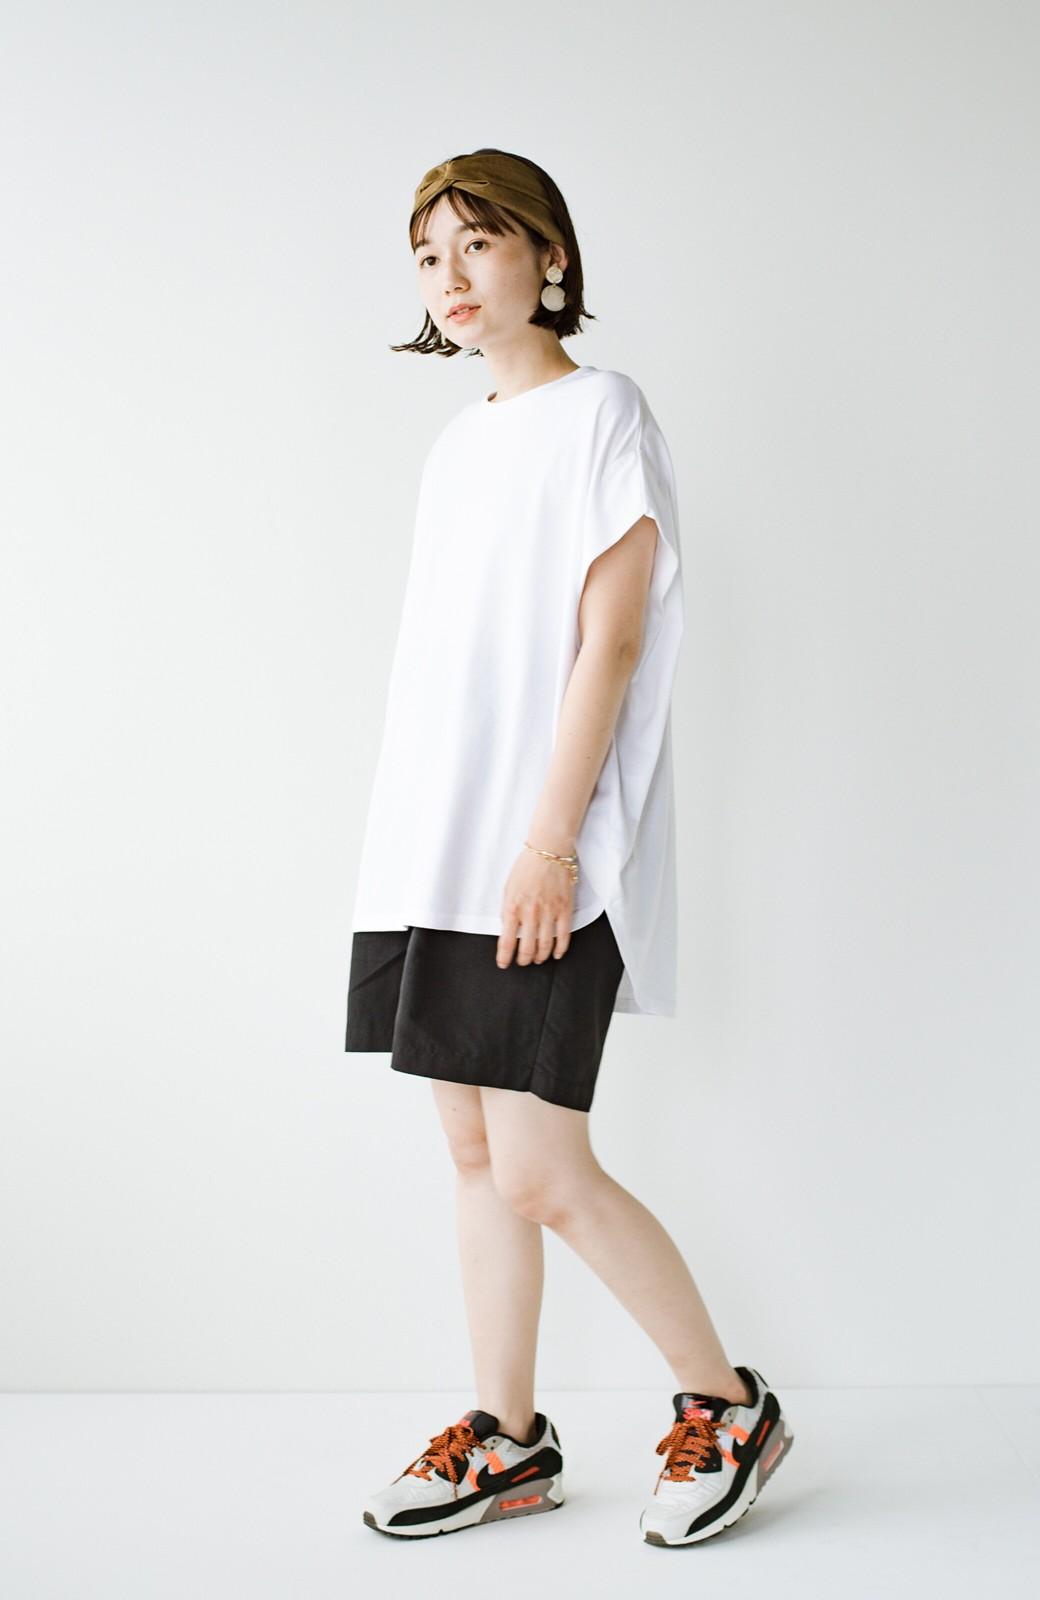 haco! PBPオーガニックコットン 楽ちんなのにブラウス気分で着られる大人のおめかしTシャツ <ホワイト>の商品写真16